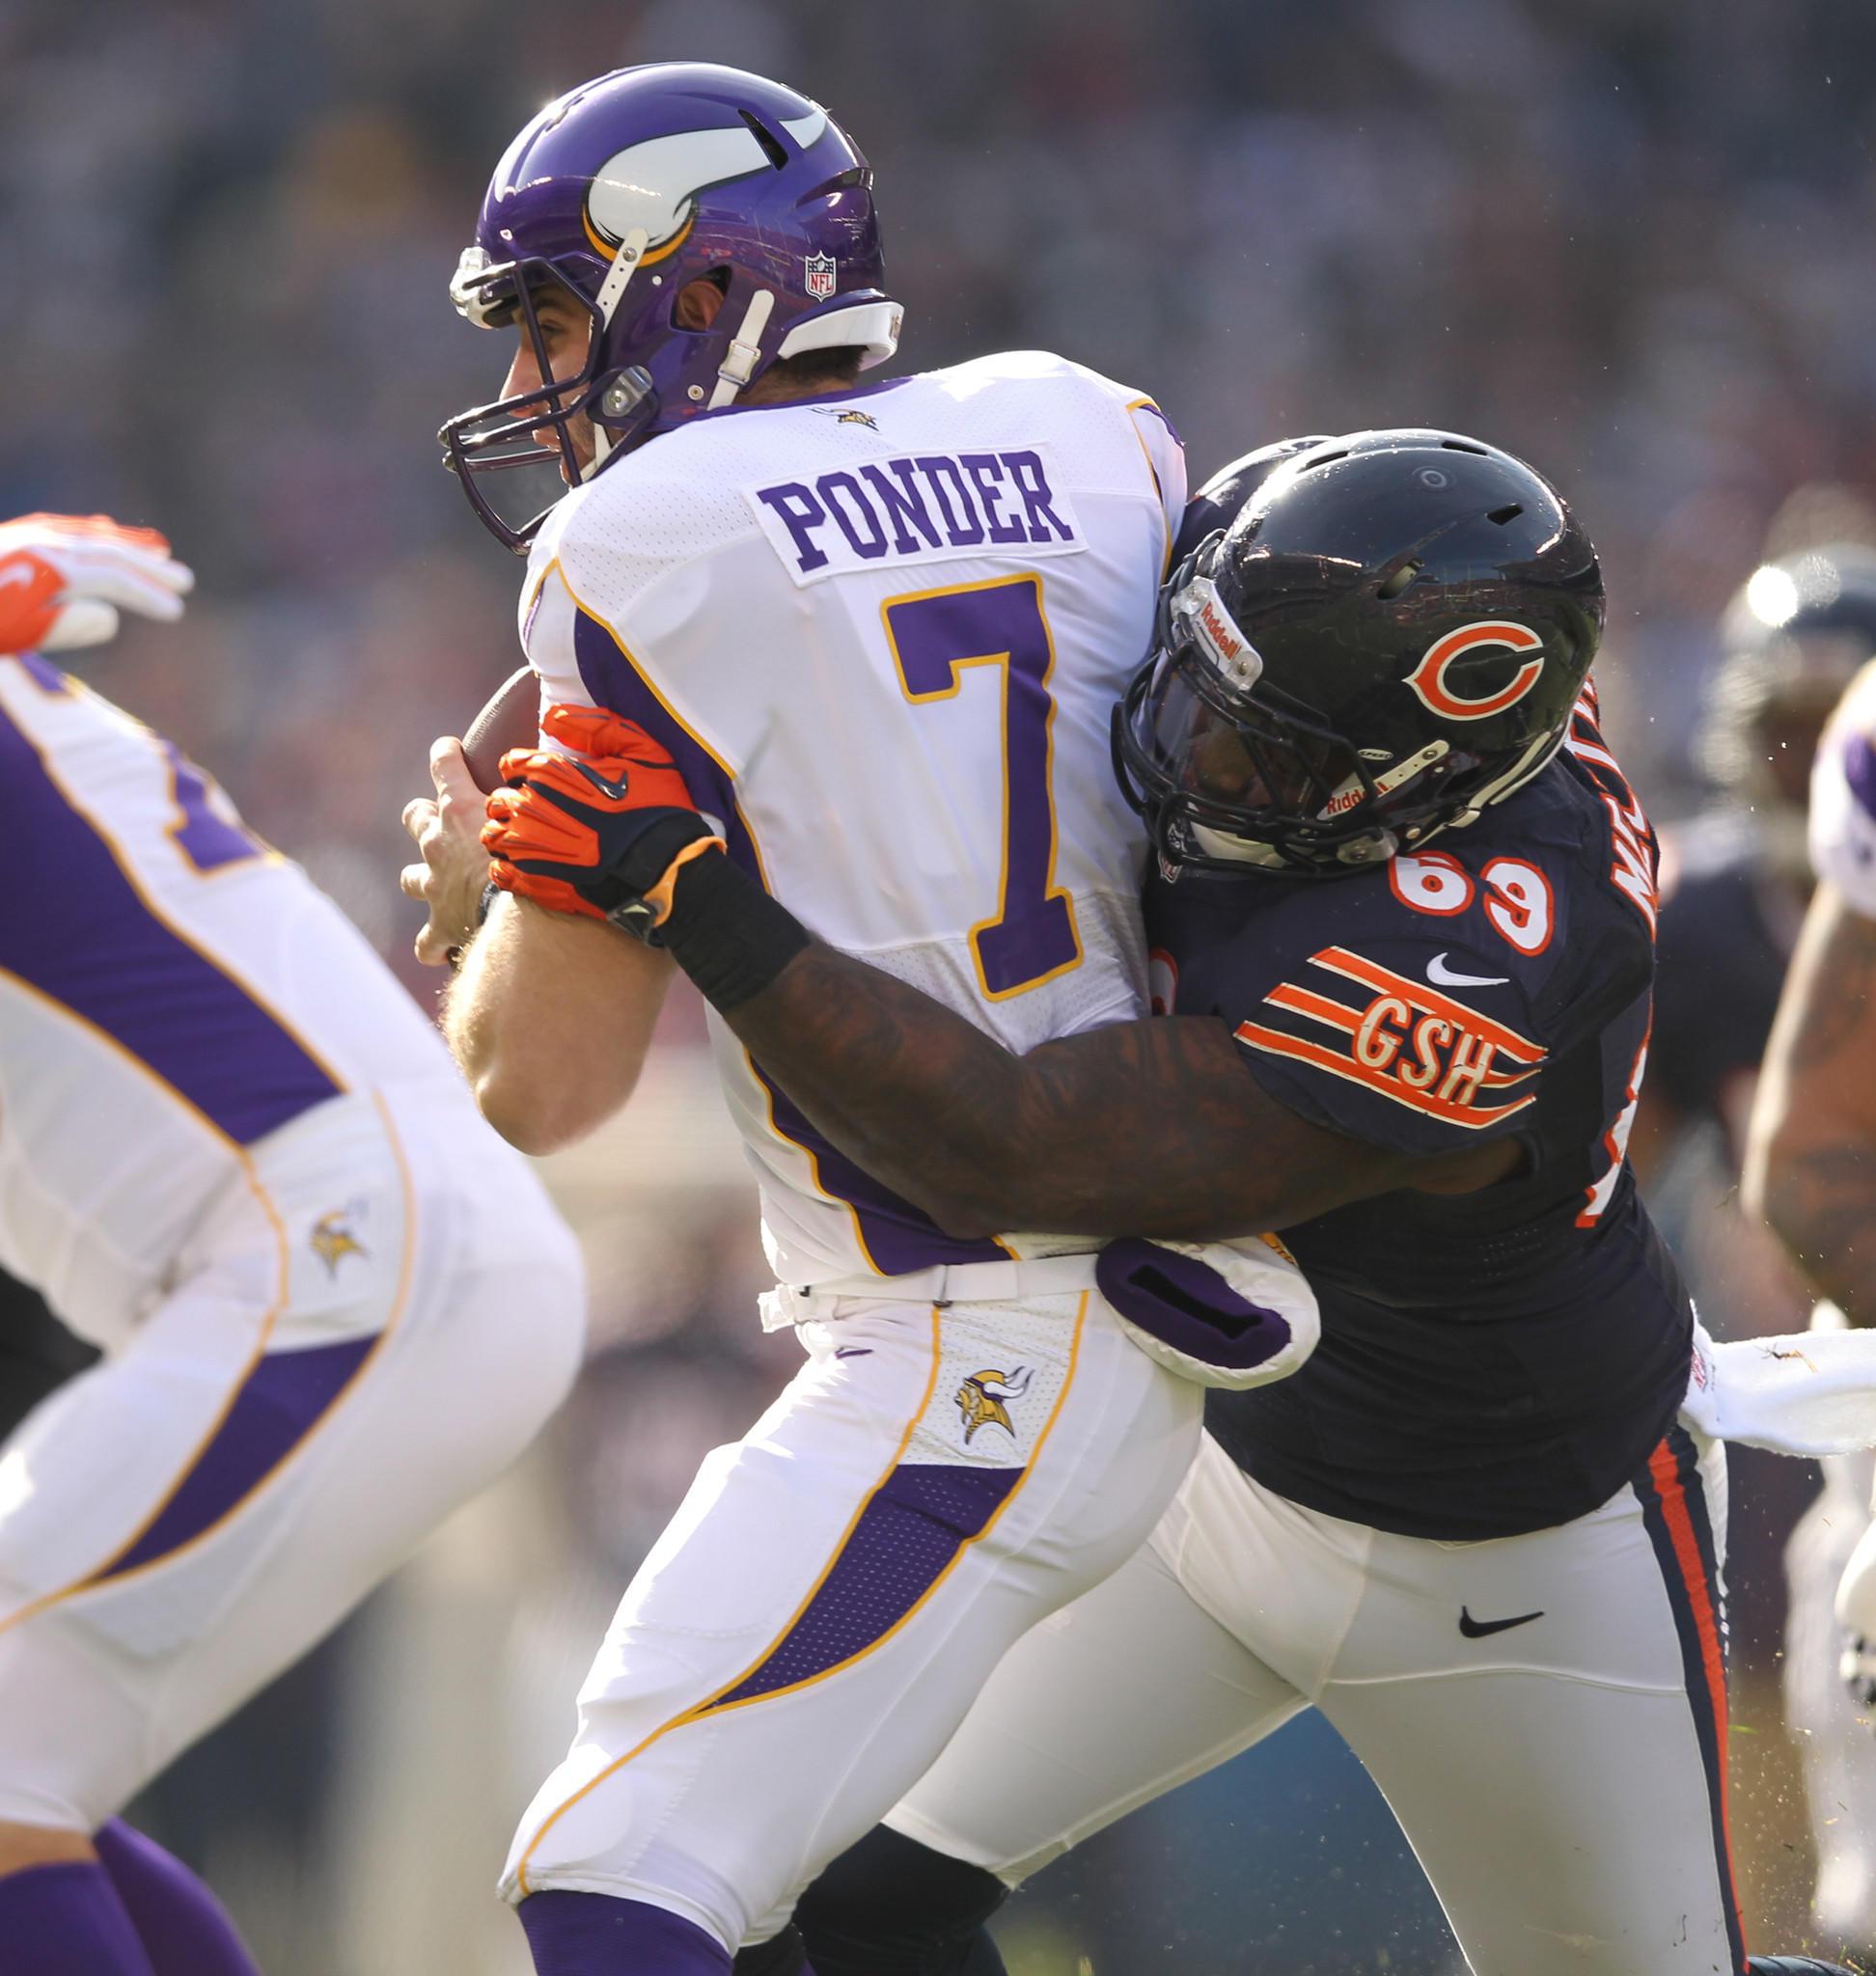 Henry Melton sacks Minnesota Vikings quarterback Christian Ponder.